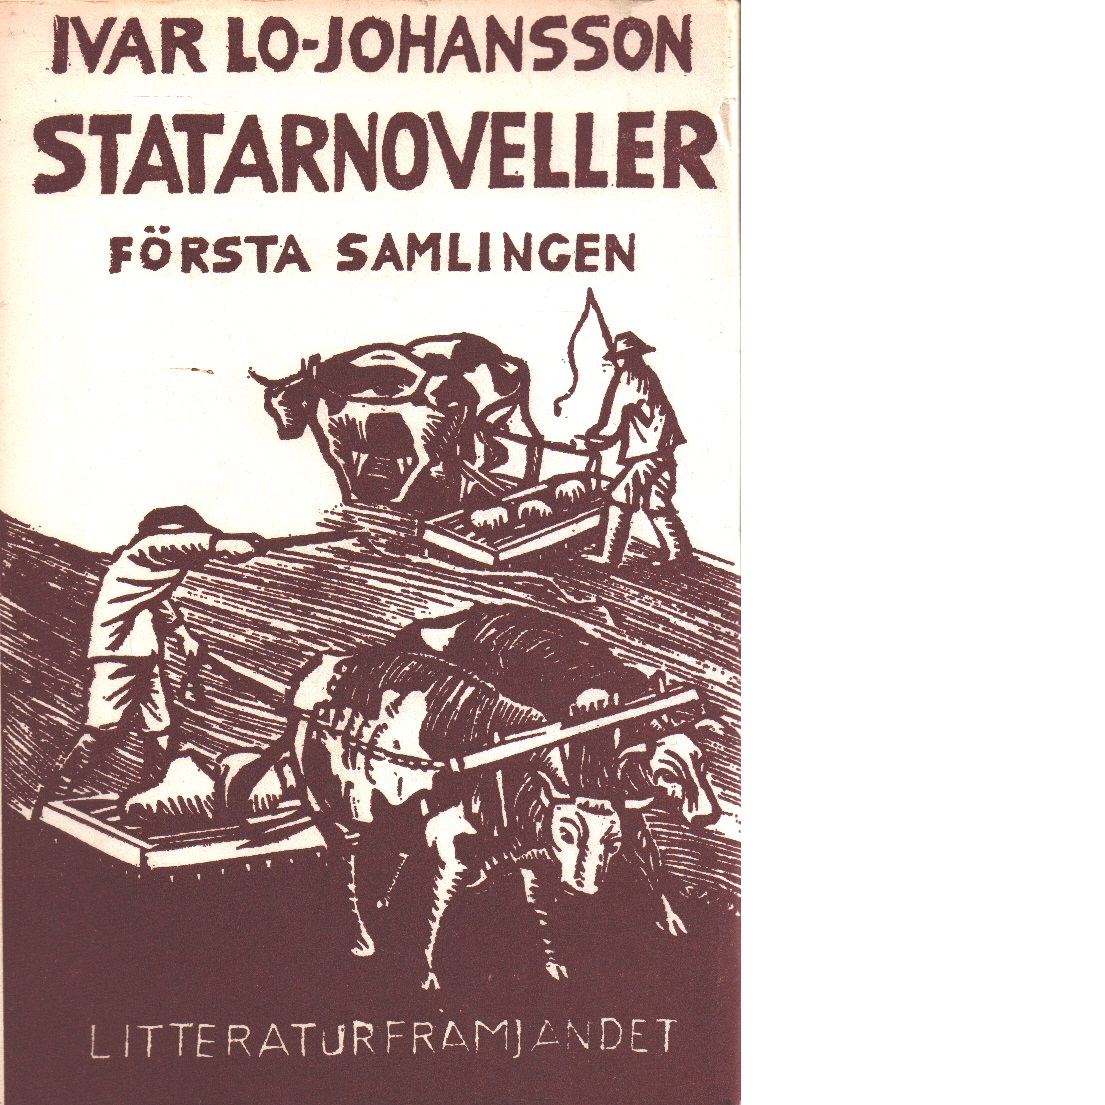 Statarnoveller. Saml. 1 / Ivar Lo-Johansson - Lo-Johansson, Ivar